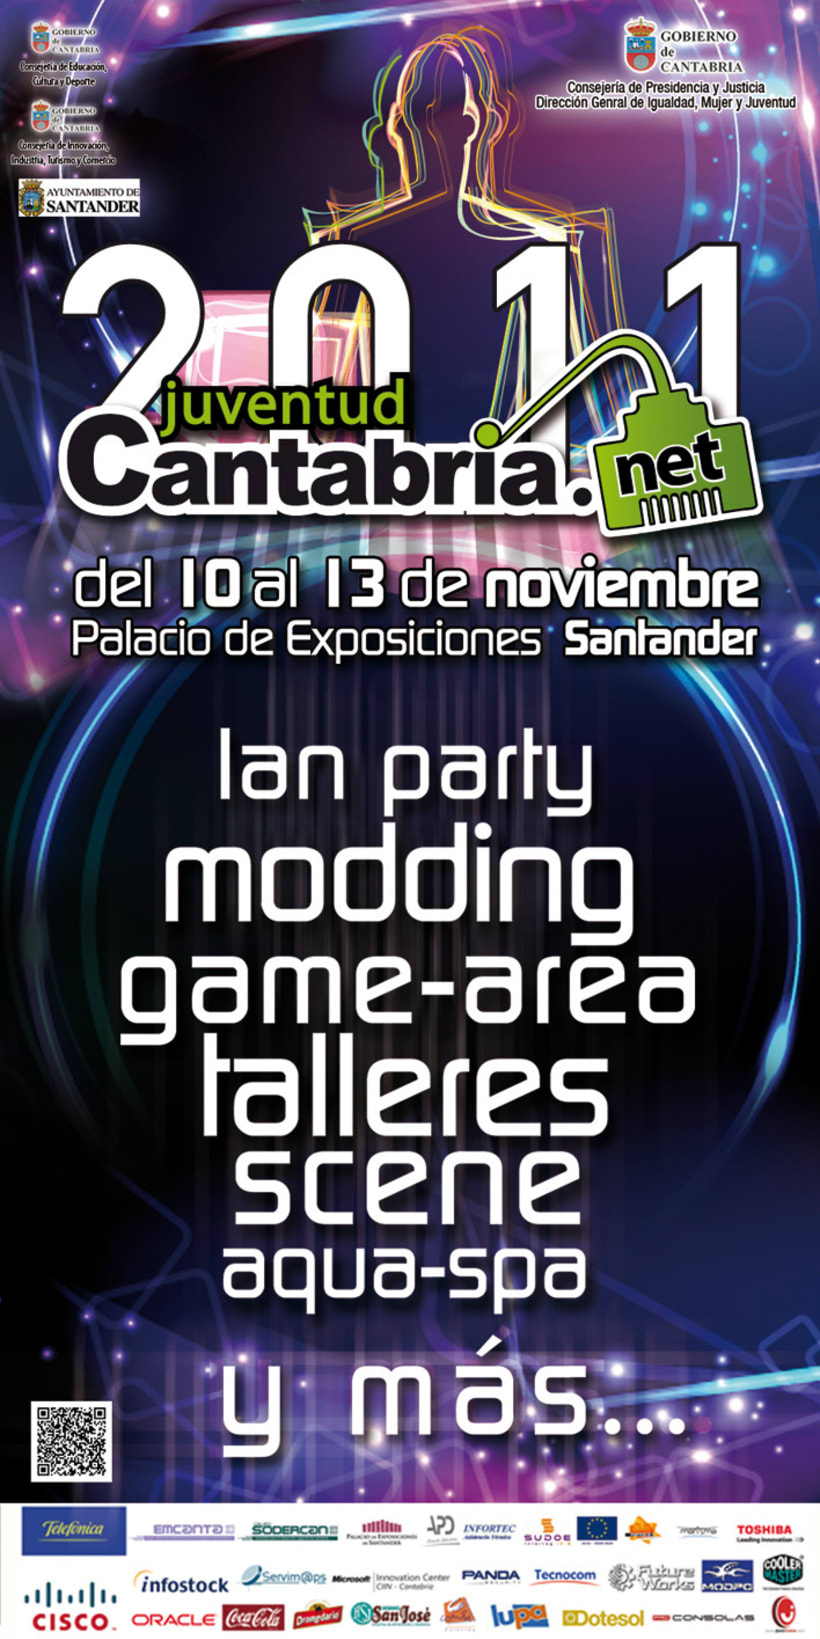 Juventud Cantabrianet 3